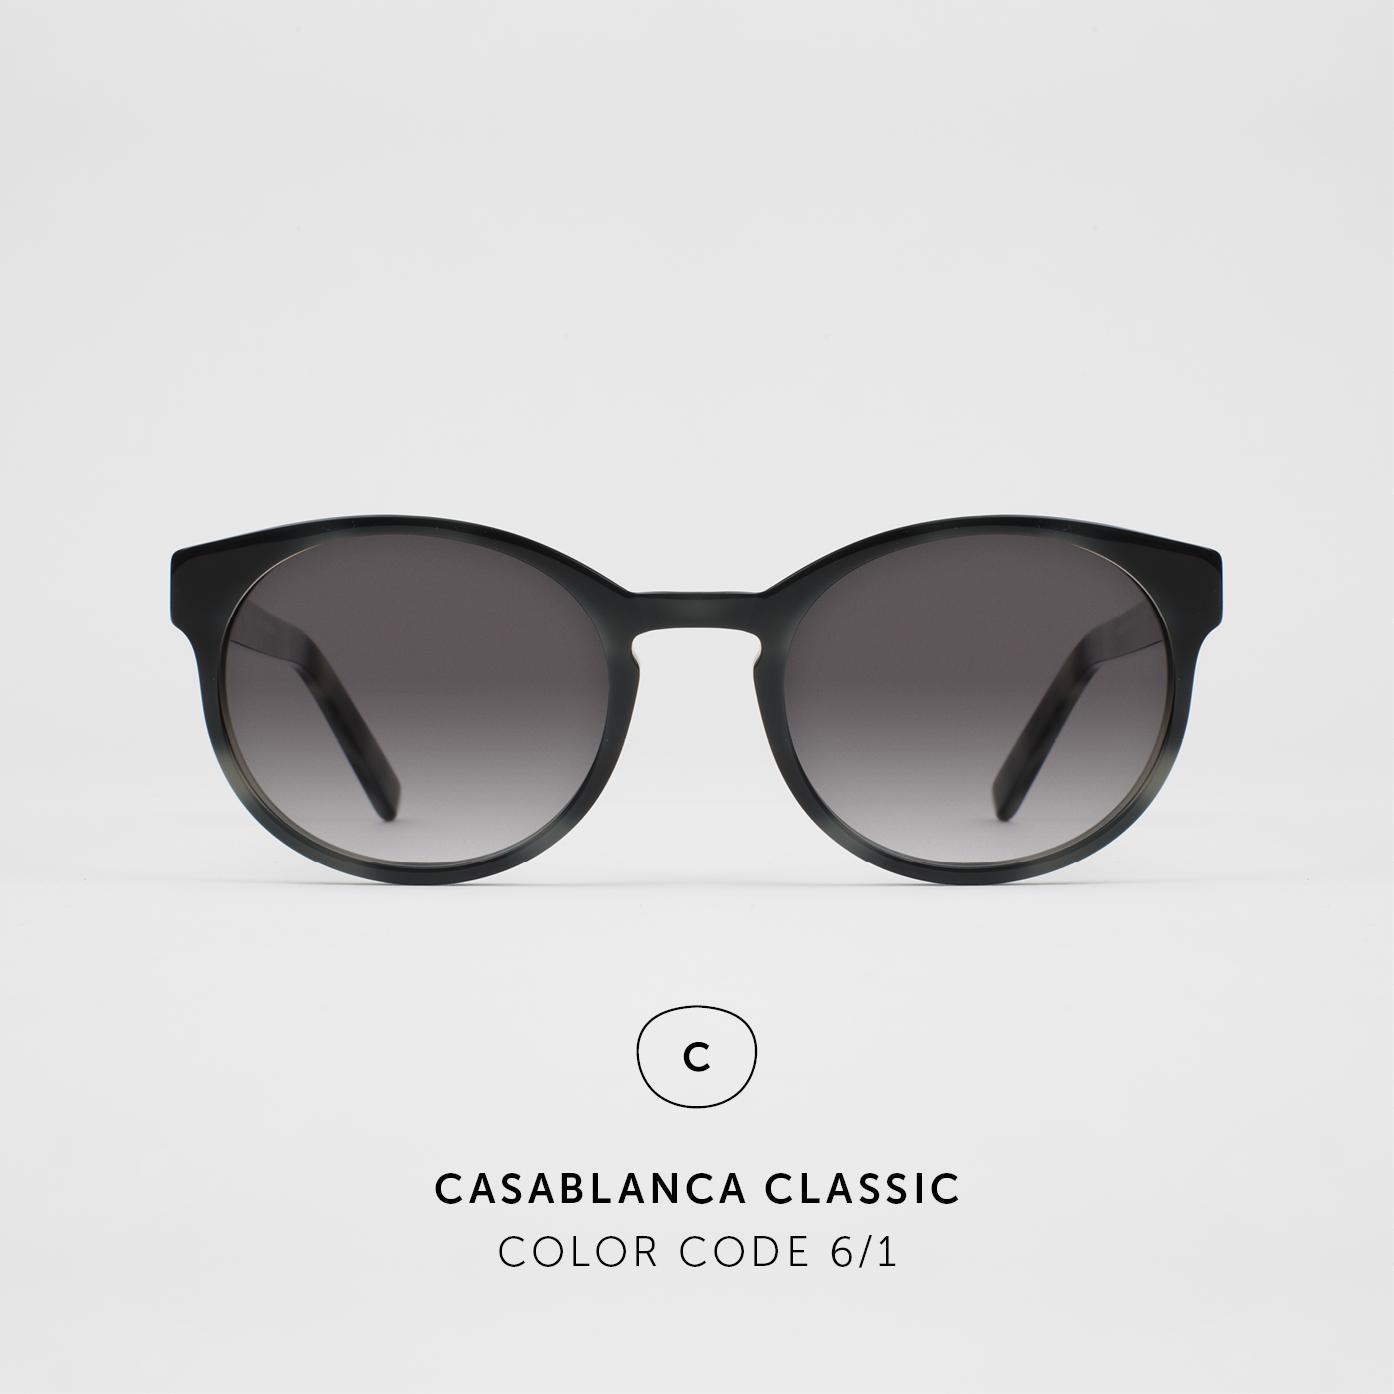 CasablancaClassic27.jpg